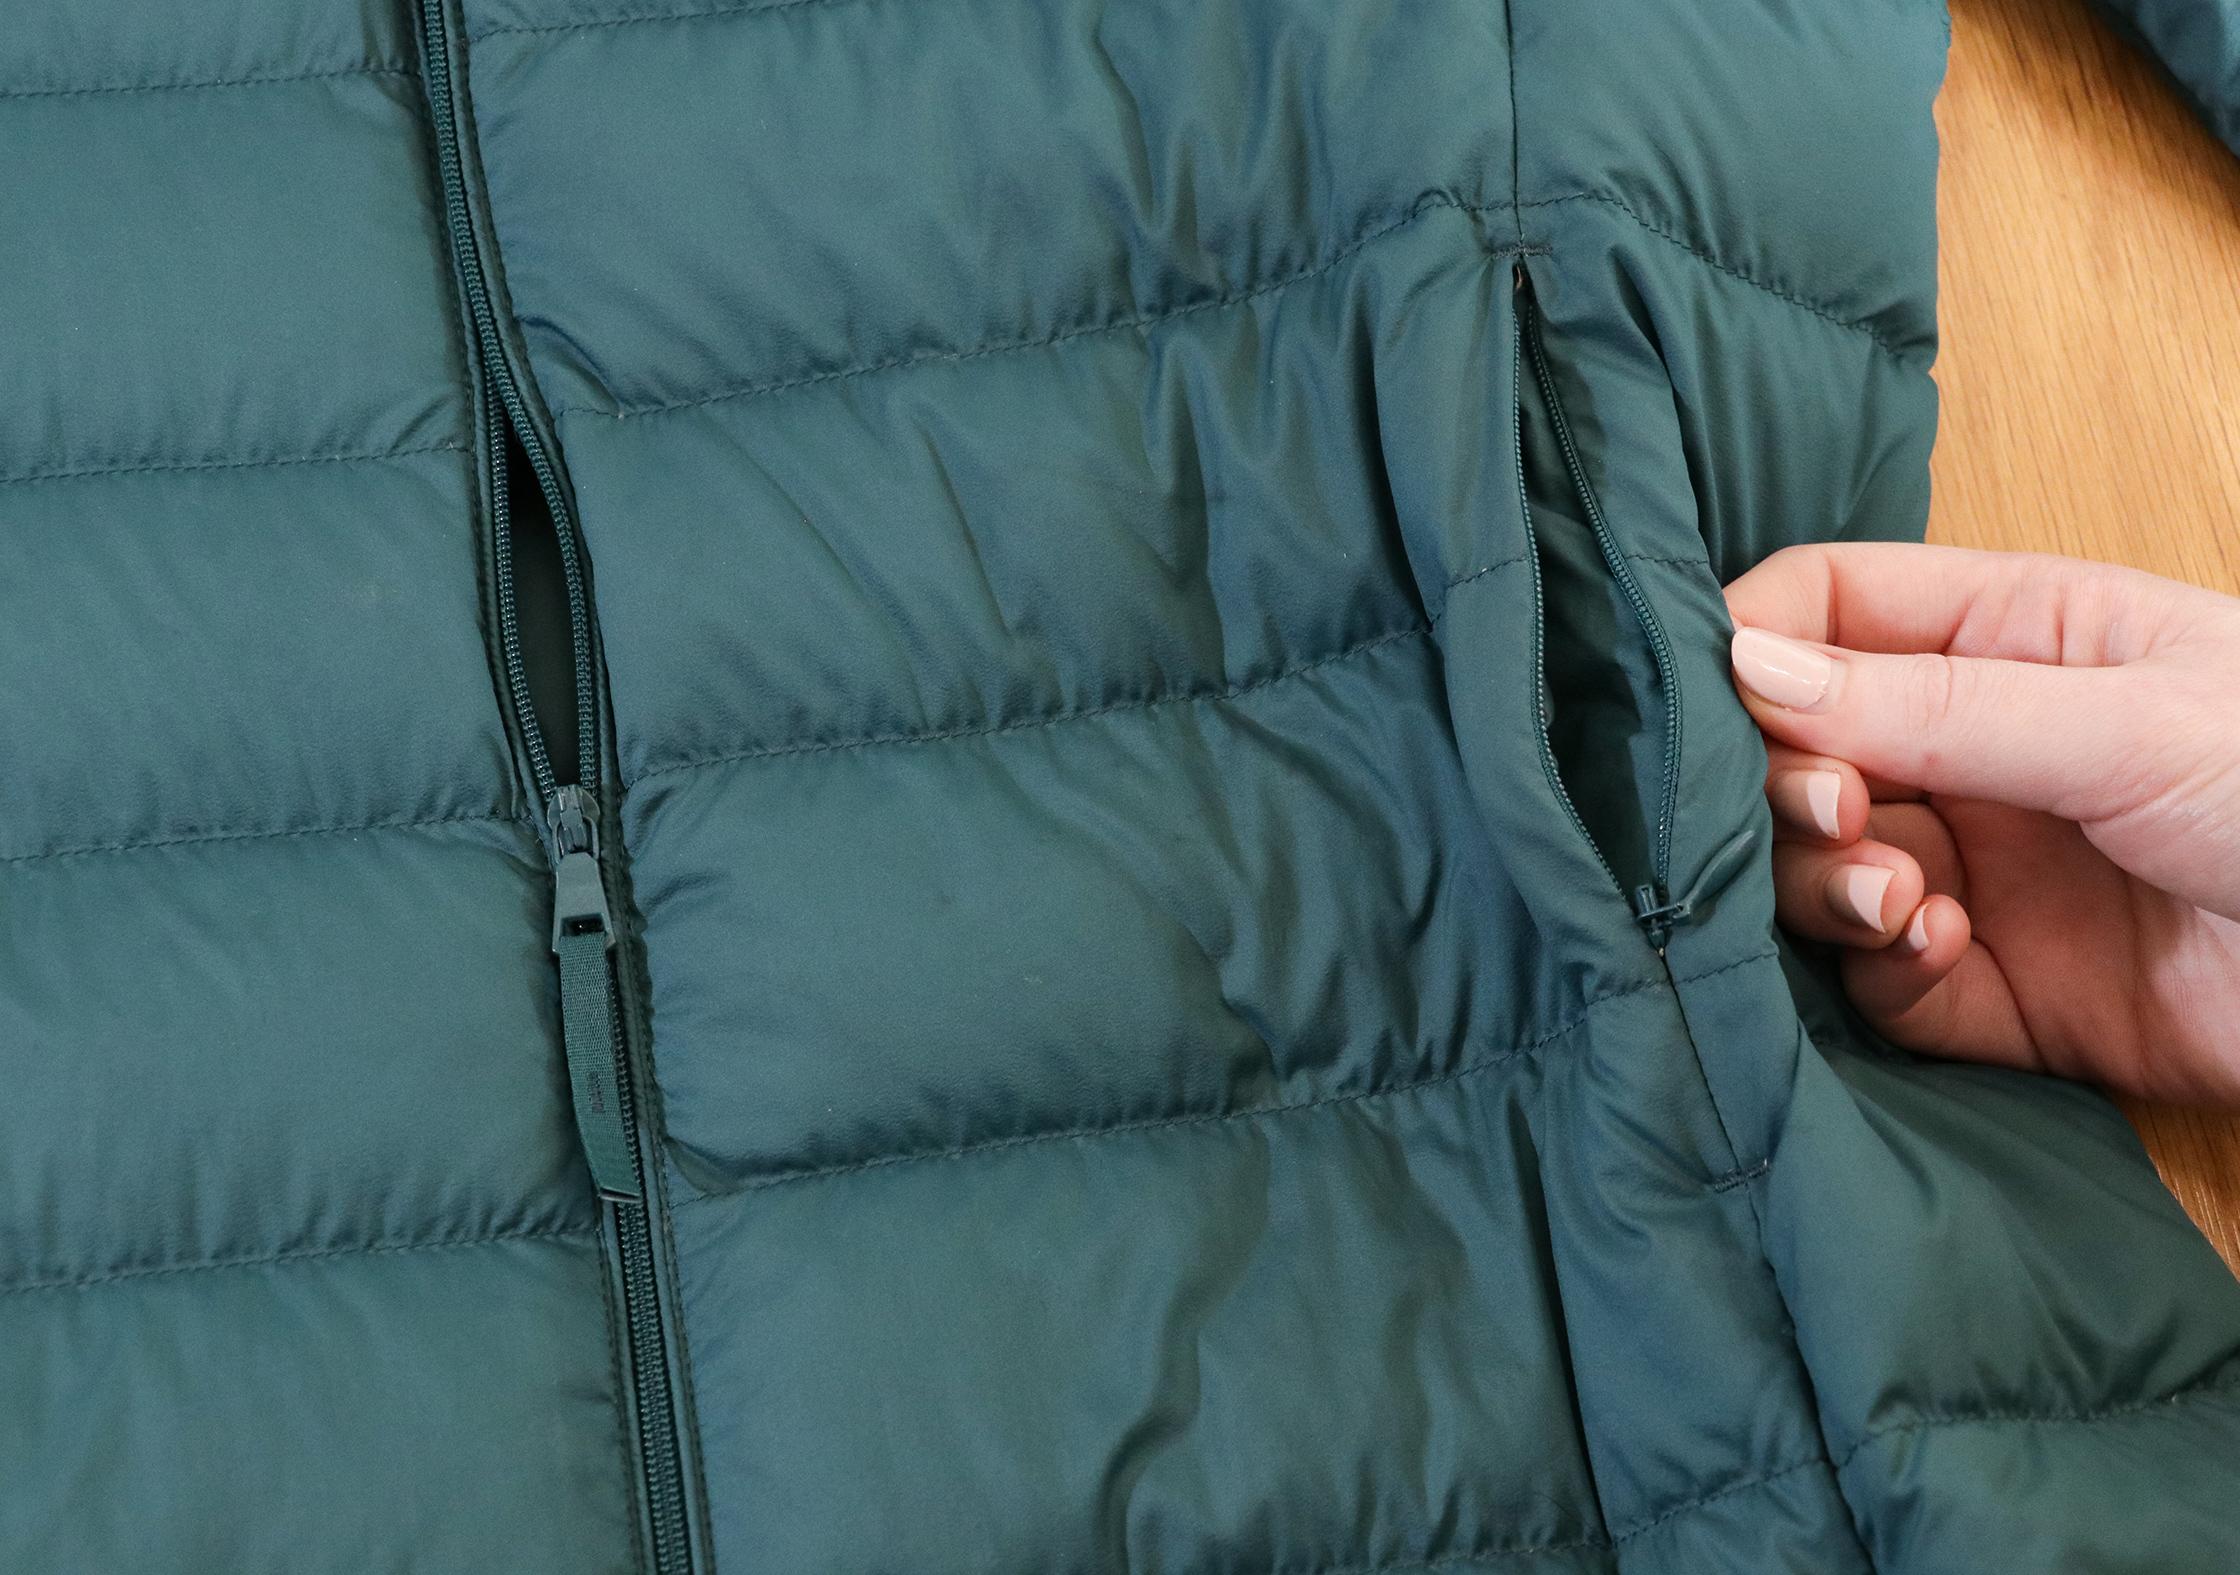 Uniqlo Ultra Light Down Jacket Zippers & Nylon Shell